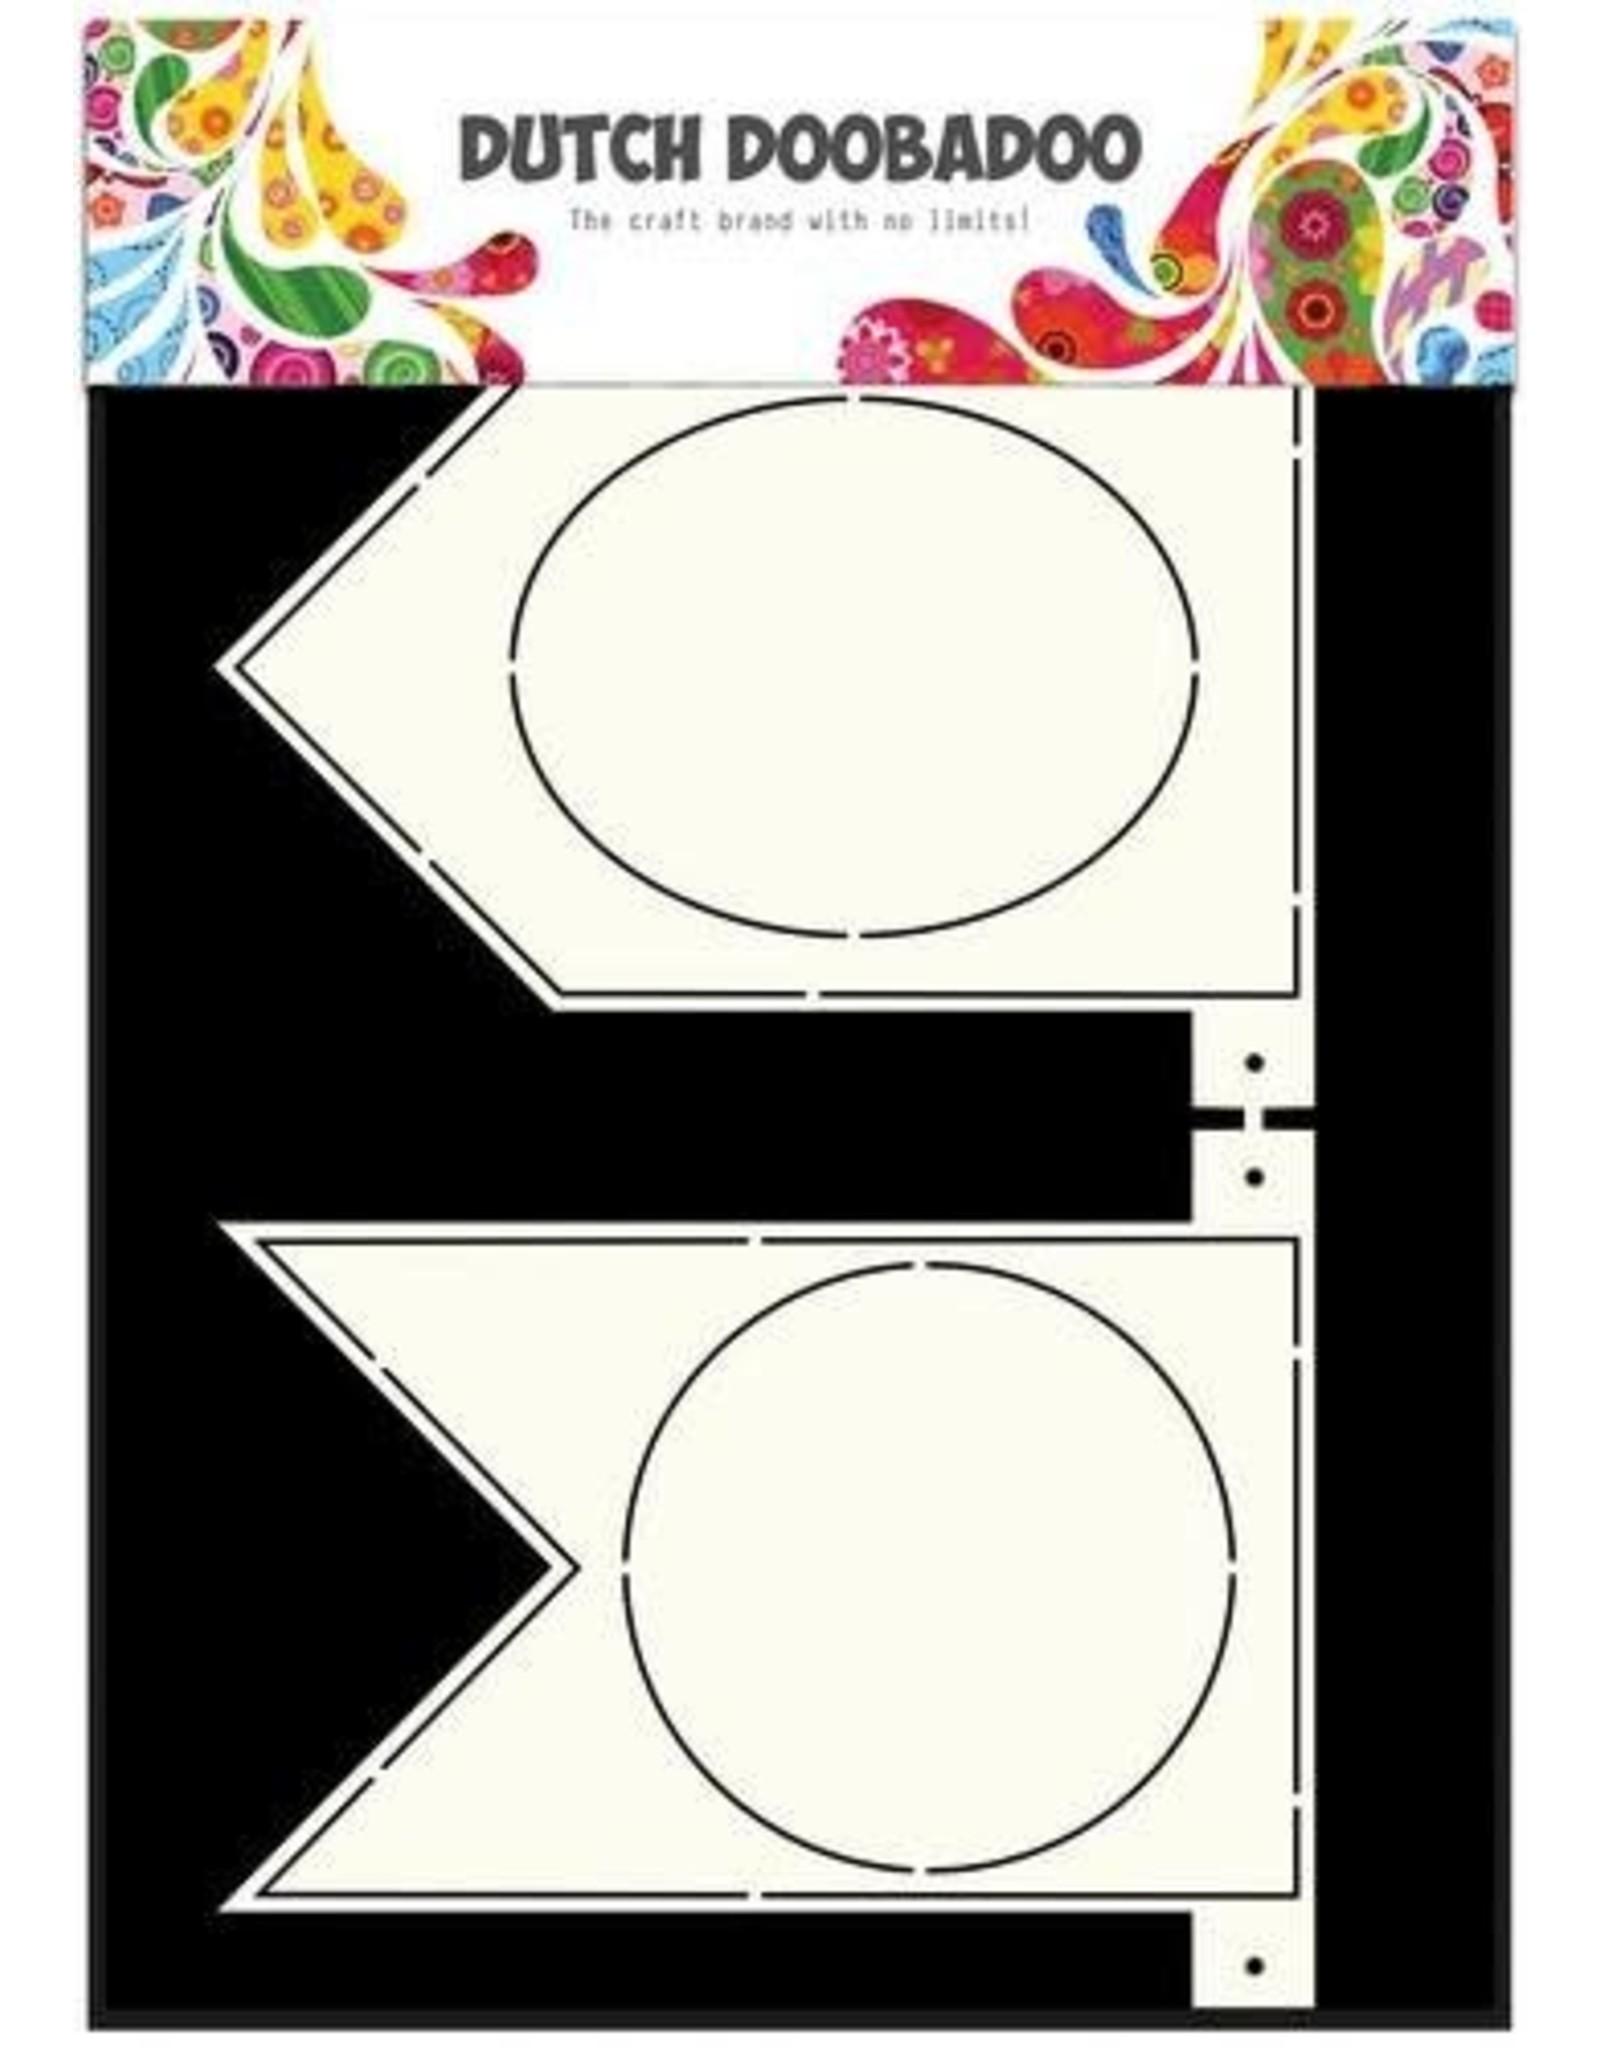 Dutch Doobadoo Shape Art Dutch Doobadoo Dutch Card Art Stencil Banner Flaggetjes A4 470.713.319